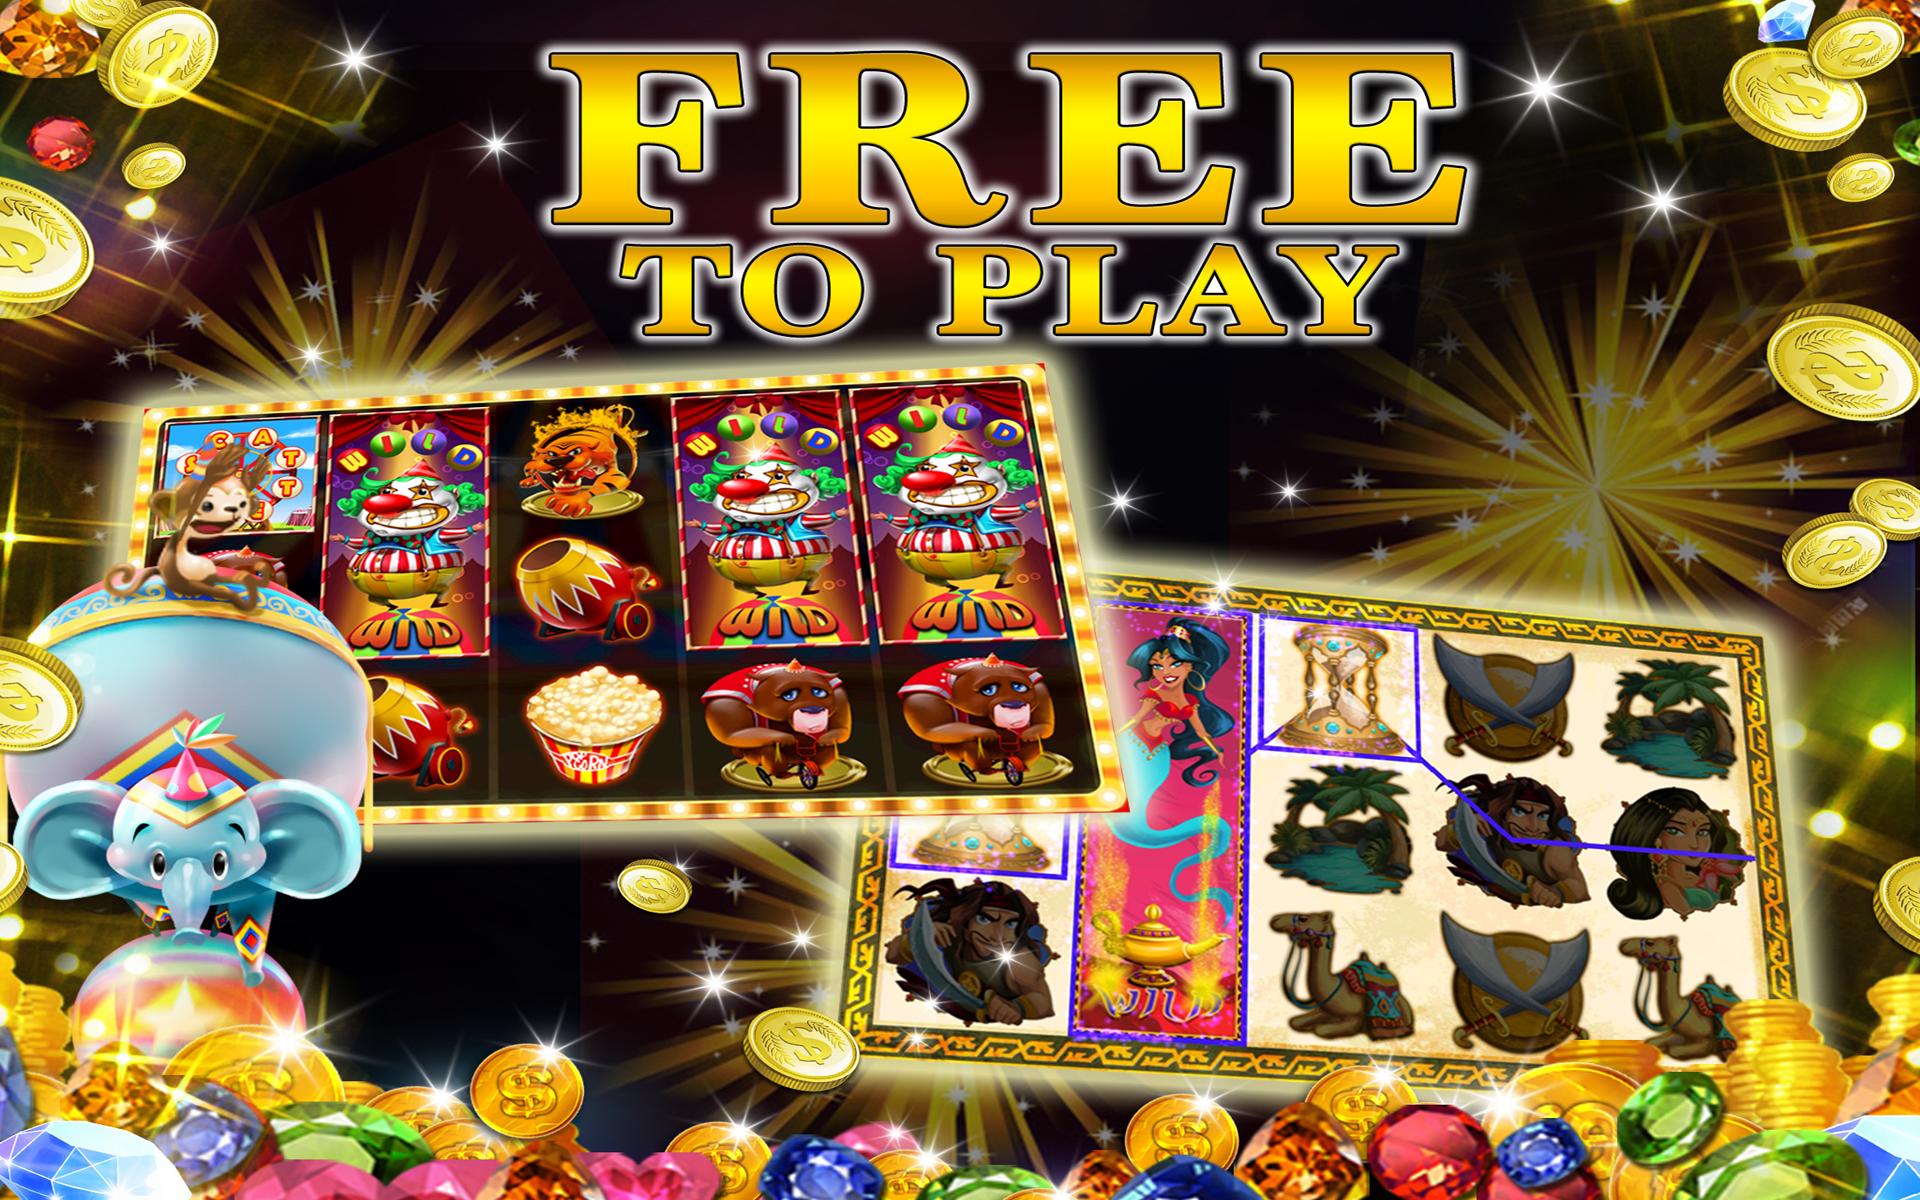 Las Vegas Style Slots